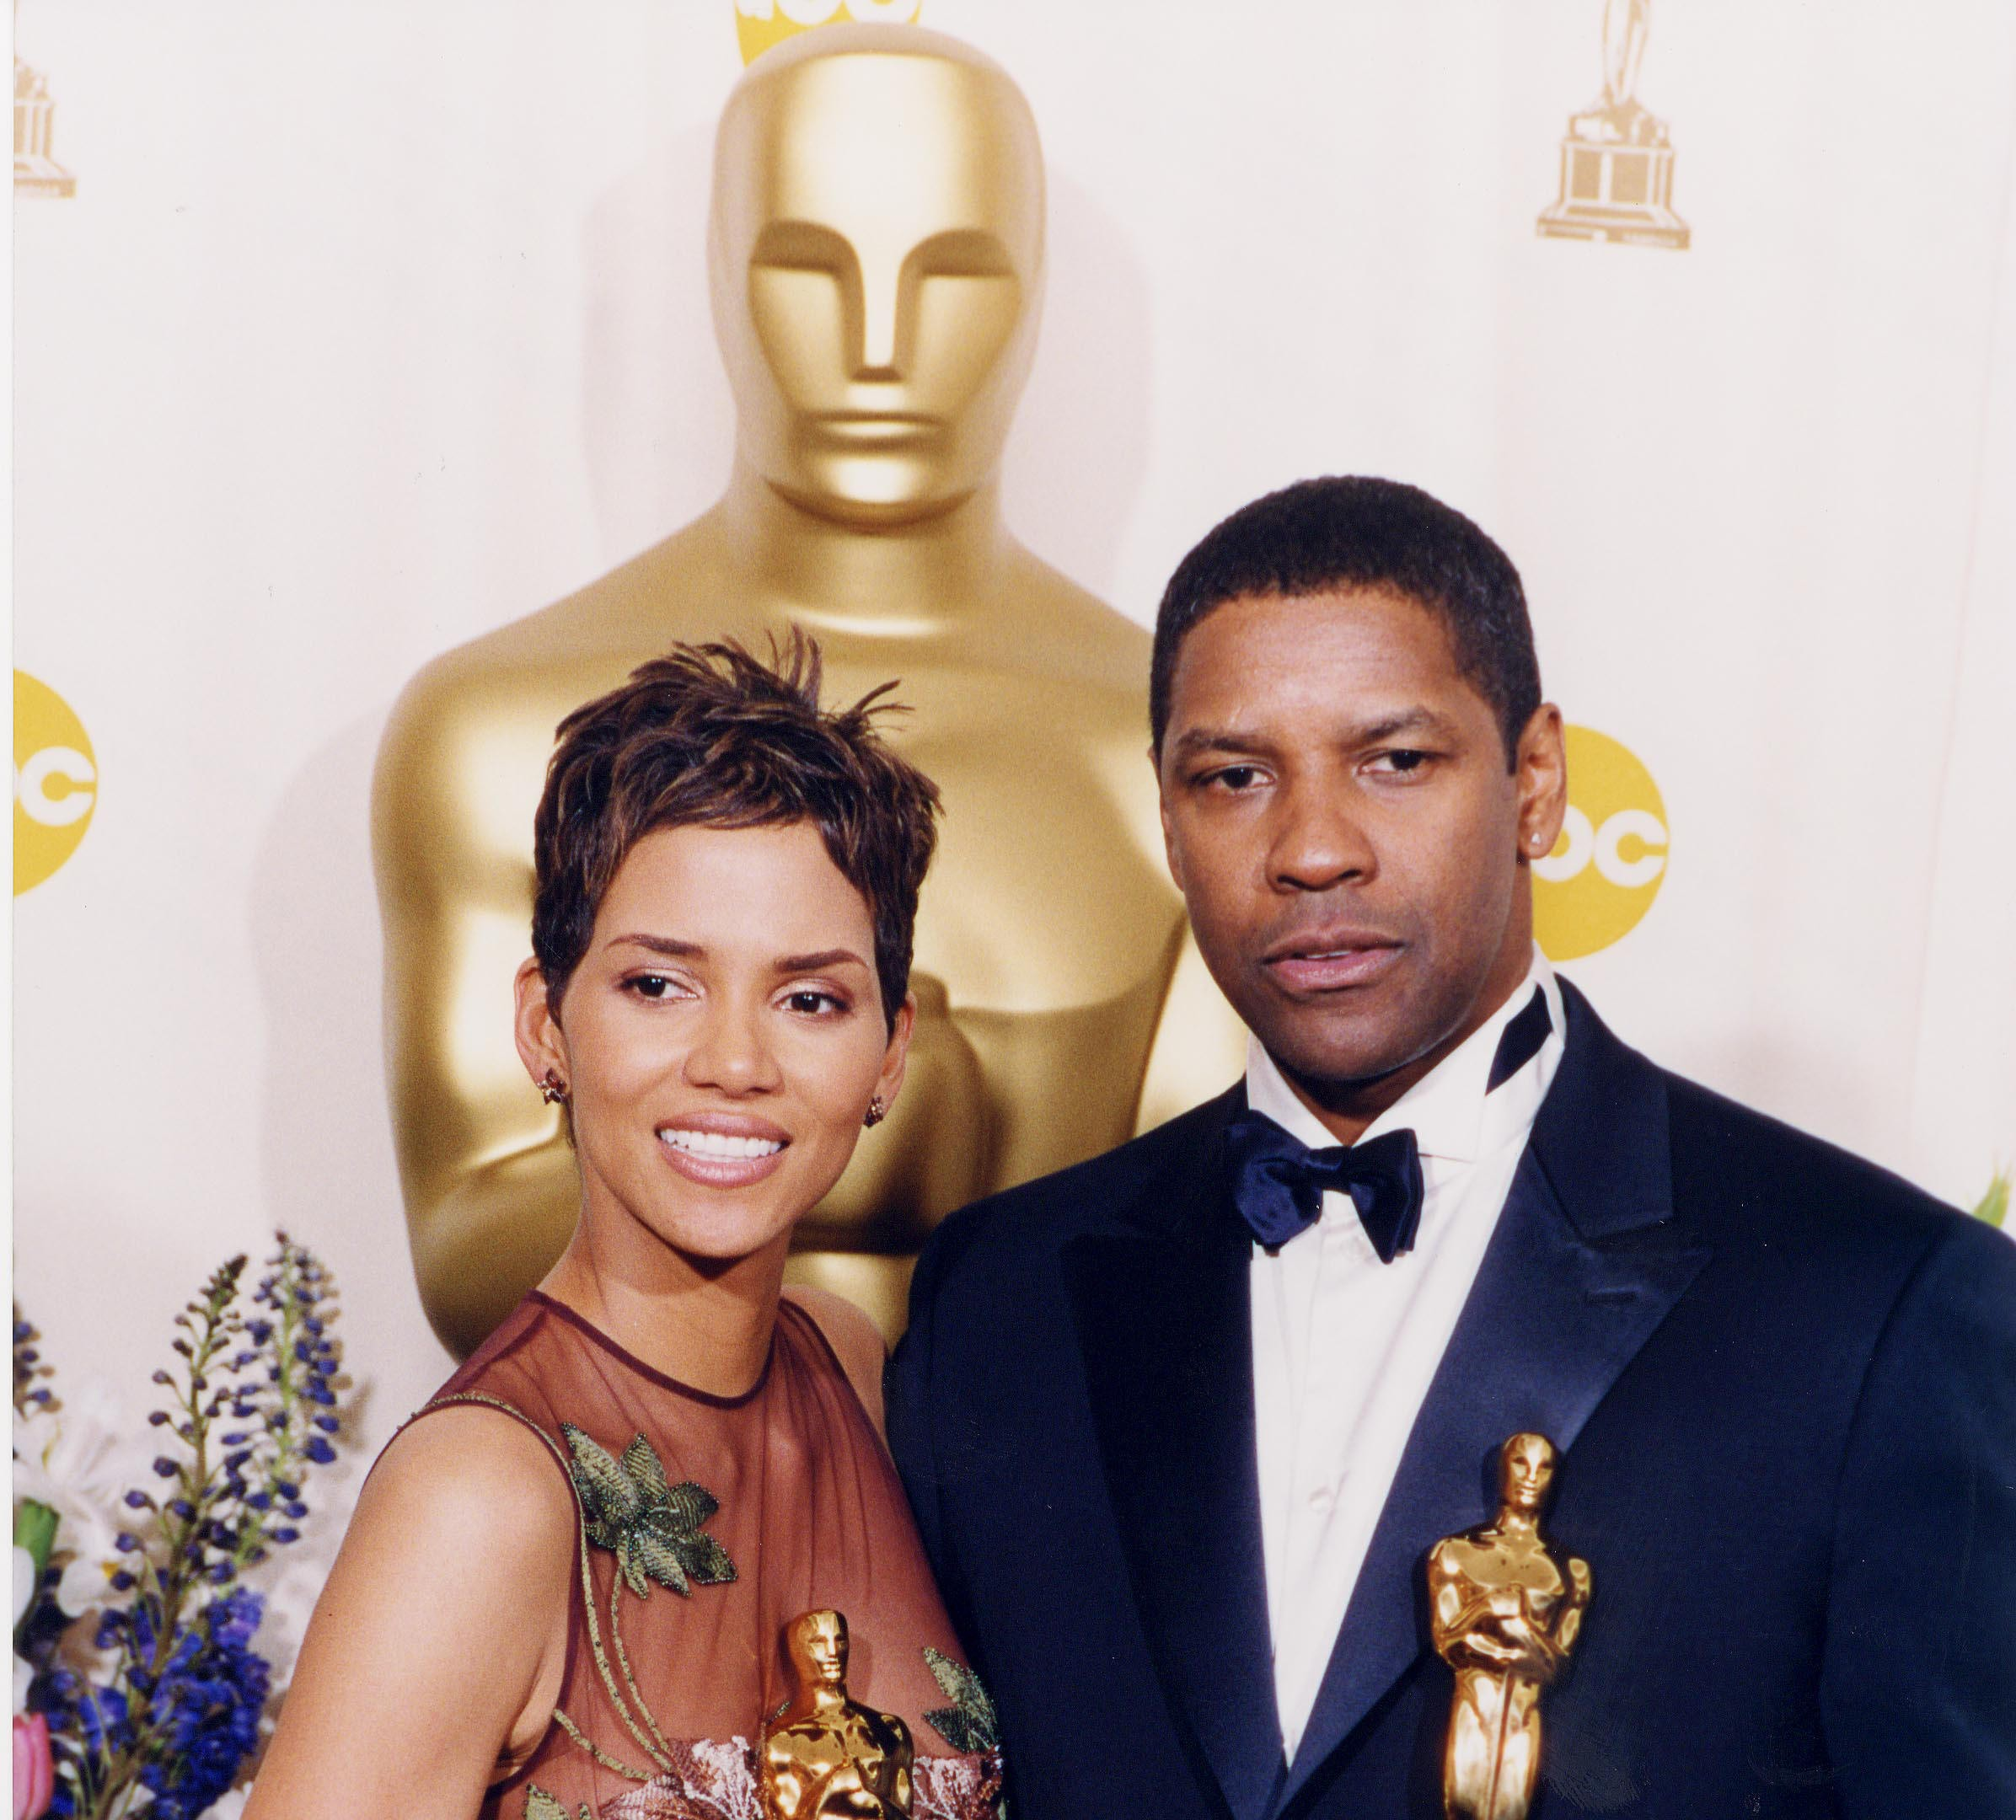 Racial diversity lacking at the Oscars